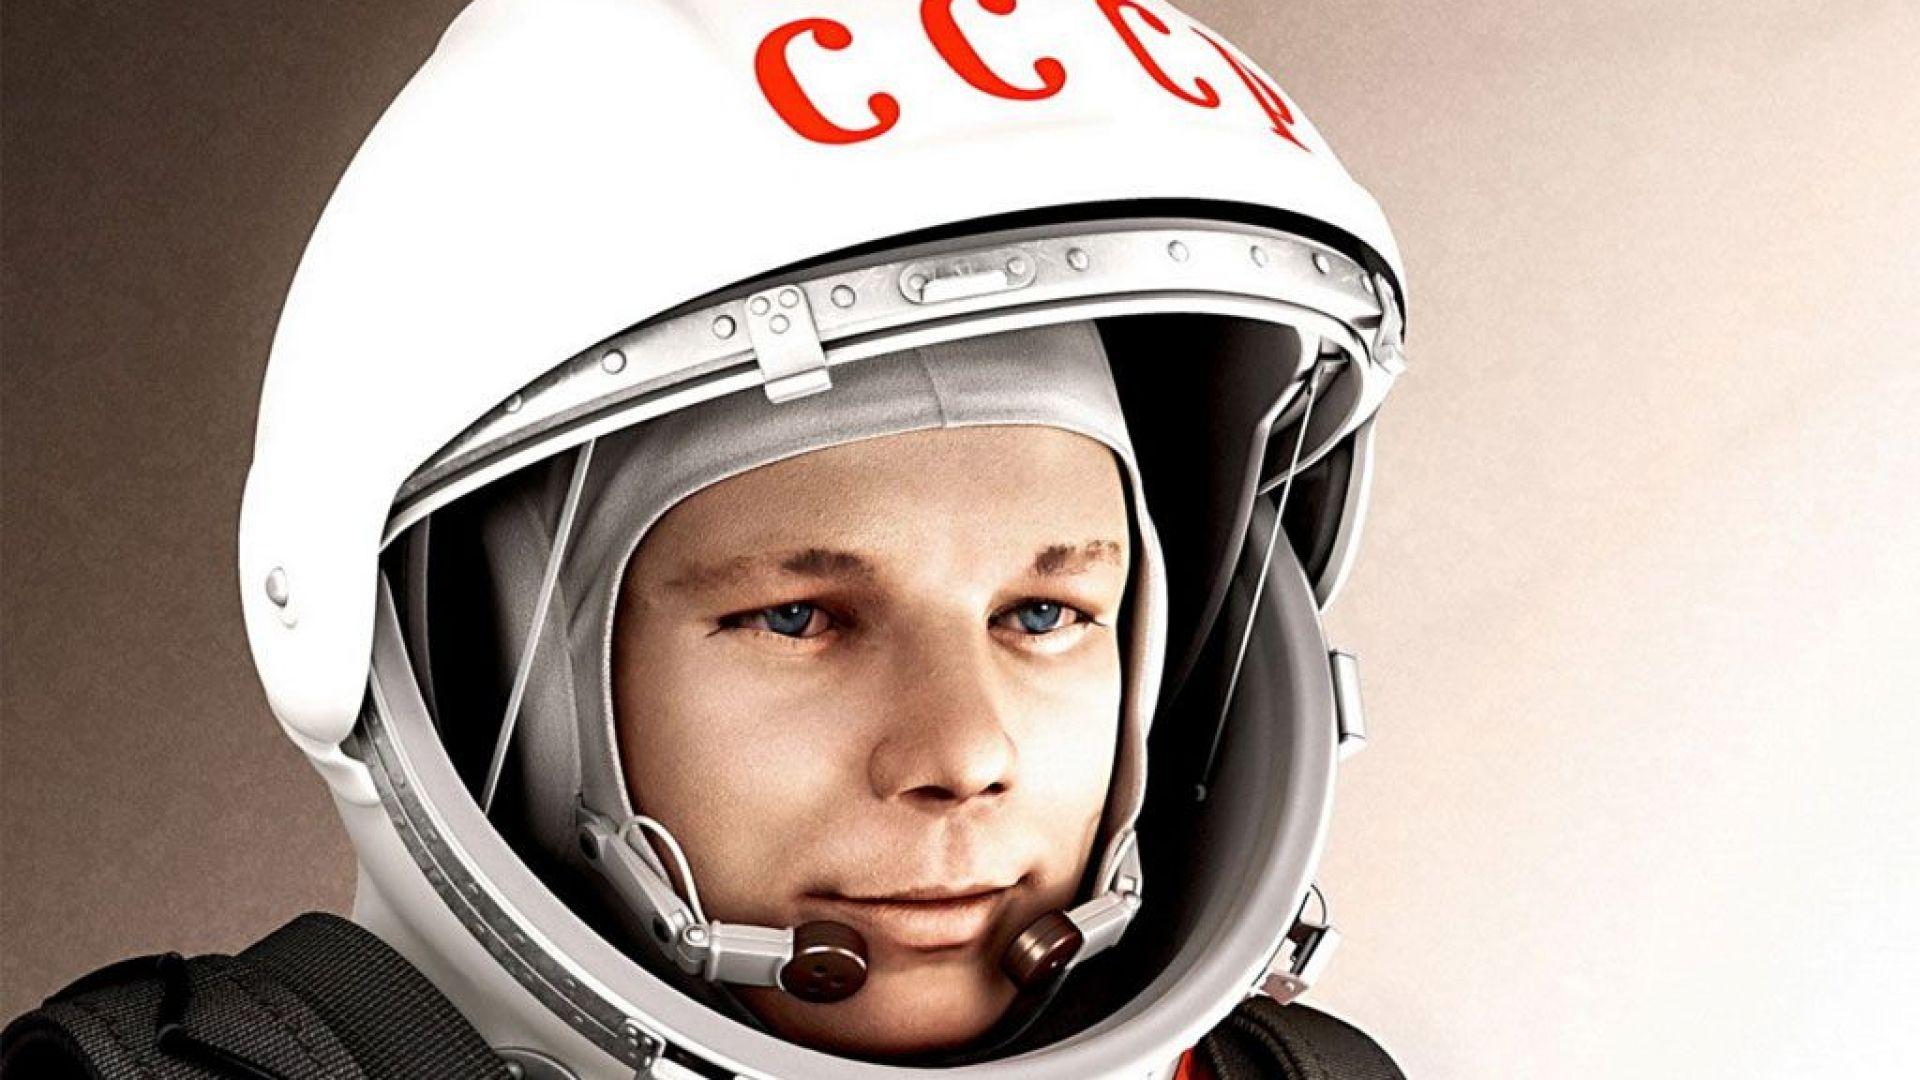 """Роскосмос"" праща двама туристи на полет около Земята по пътя на Гагарин"